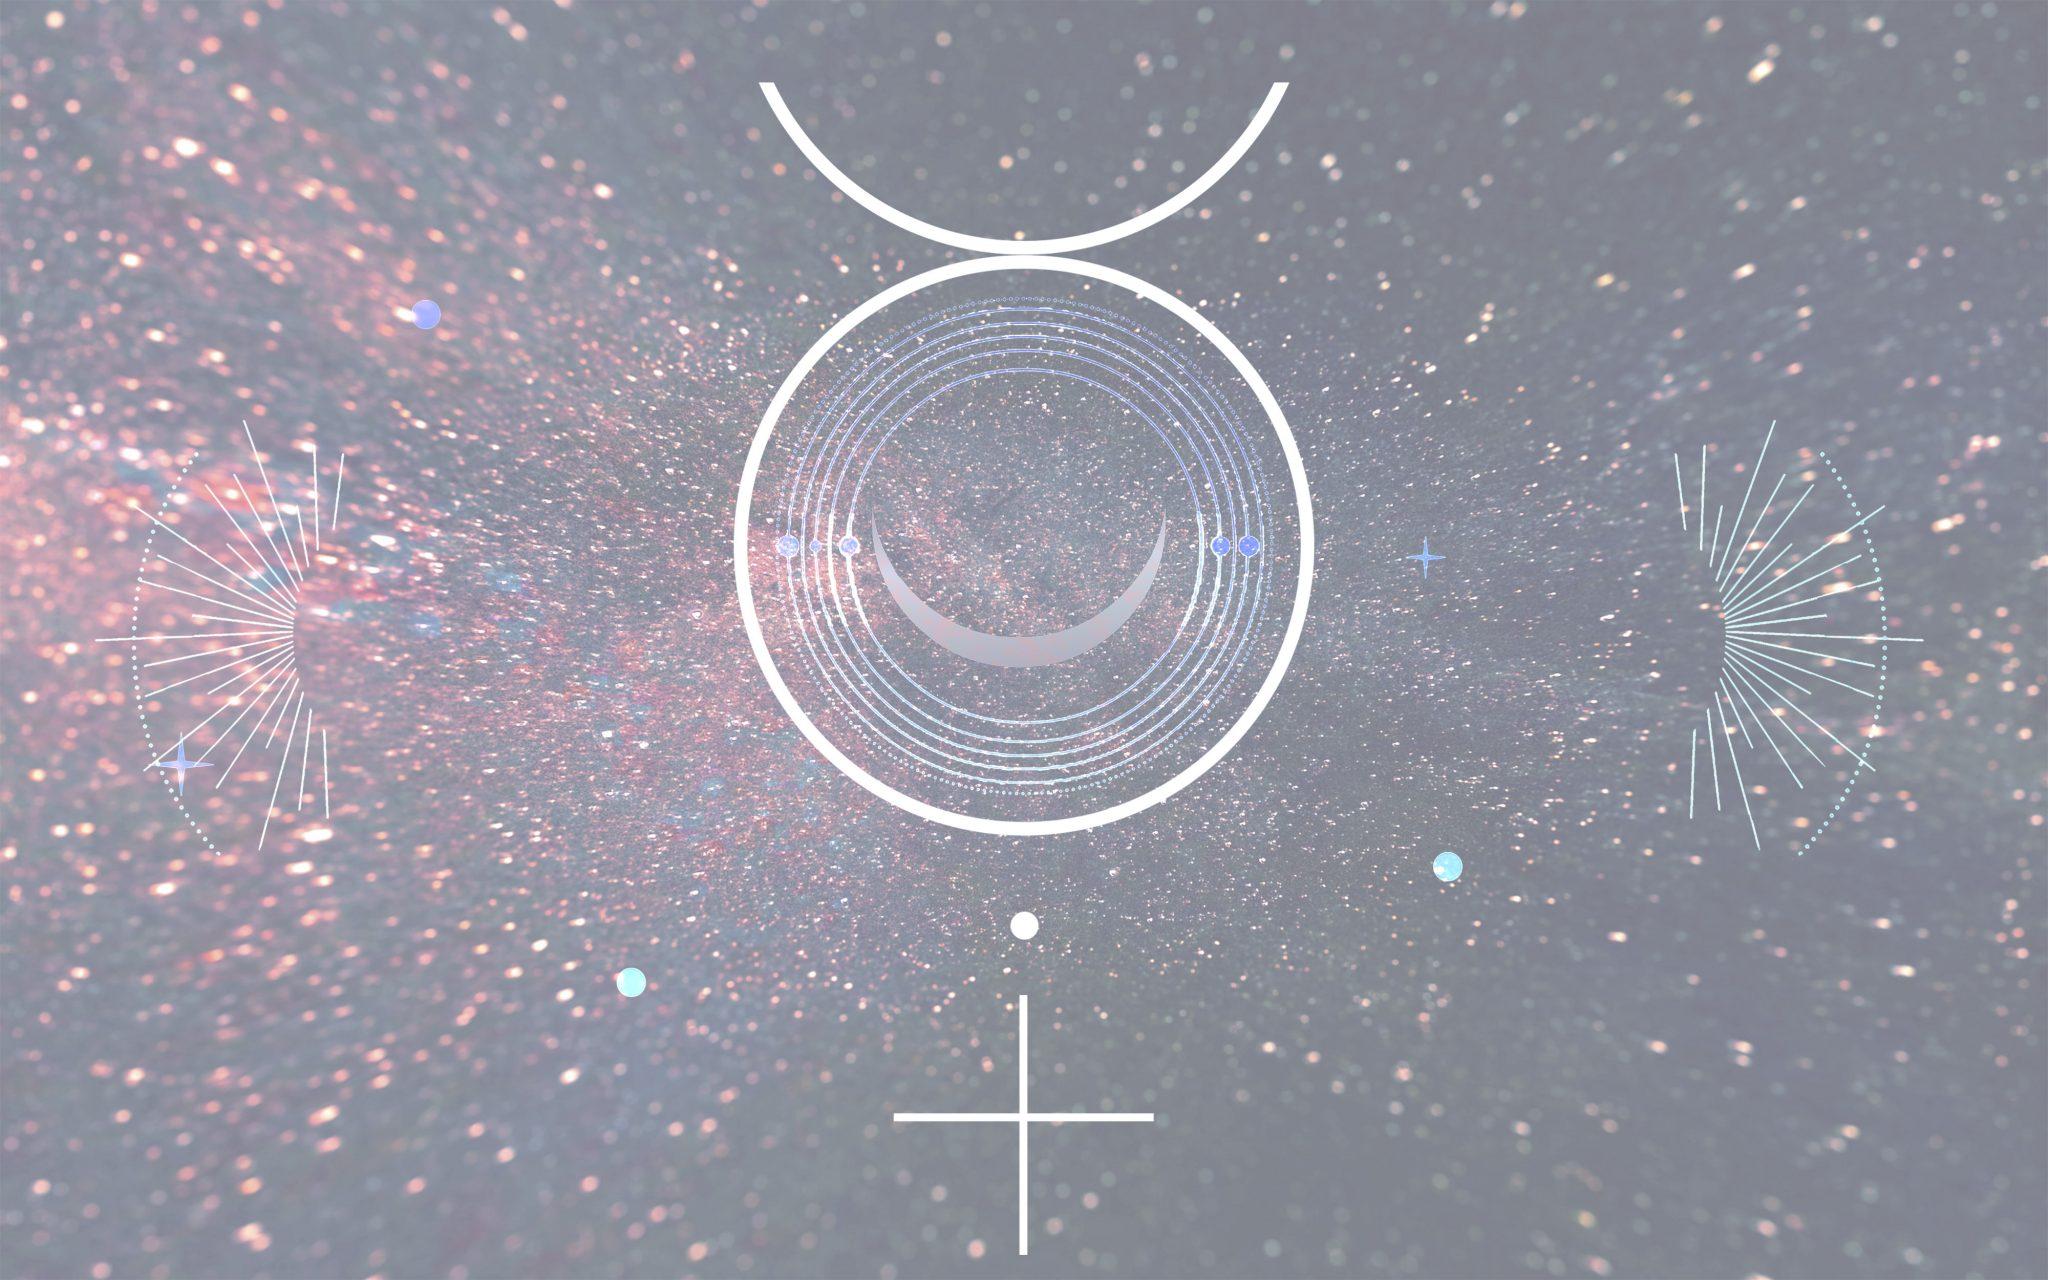 Mercury Retrograde February 2020 Girl and Her Moon